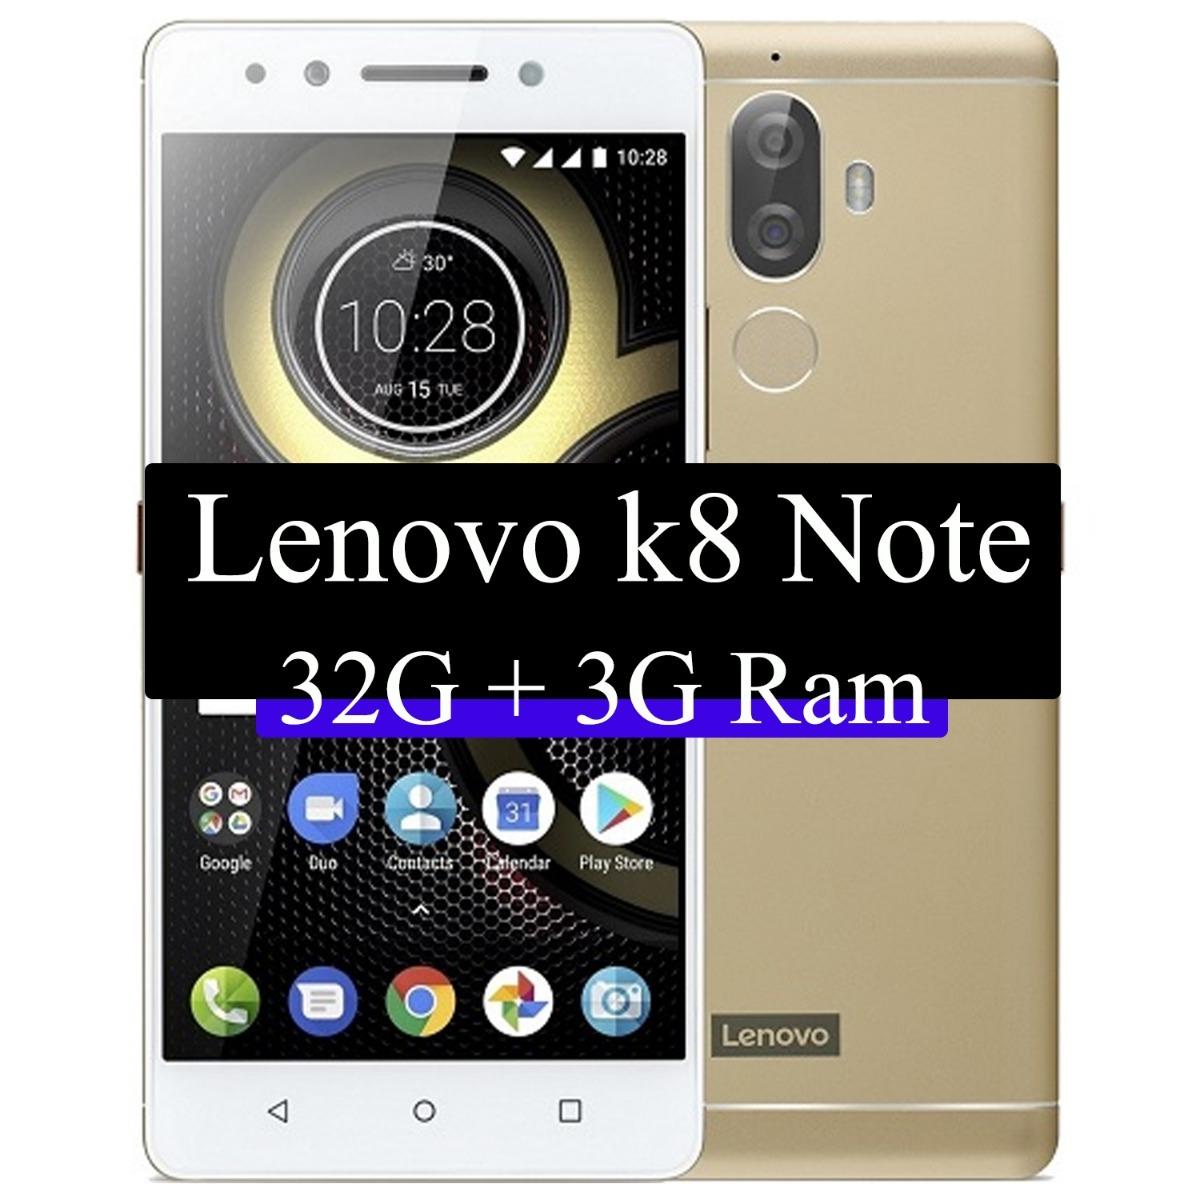 Smartphone Lenovo K8 Note - Biometria 3g Ram 32gb Cam 13mp